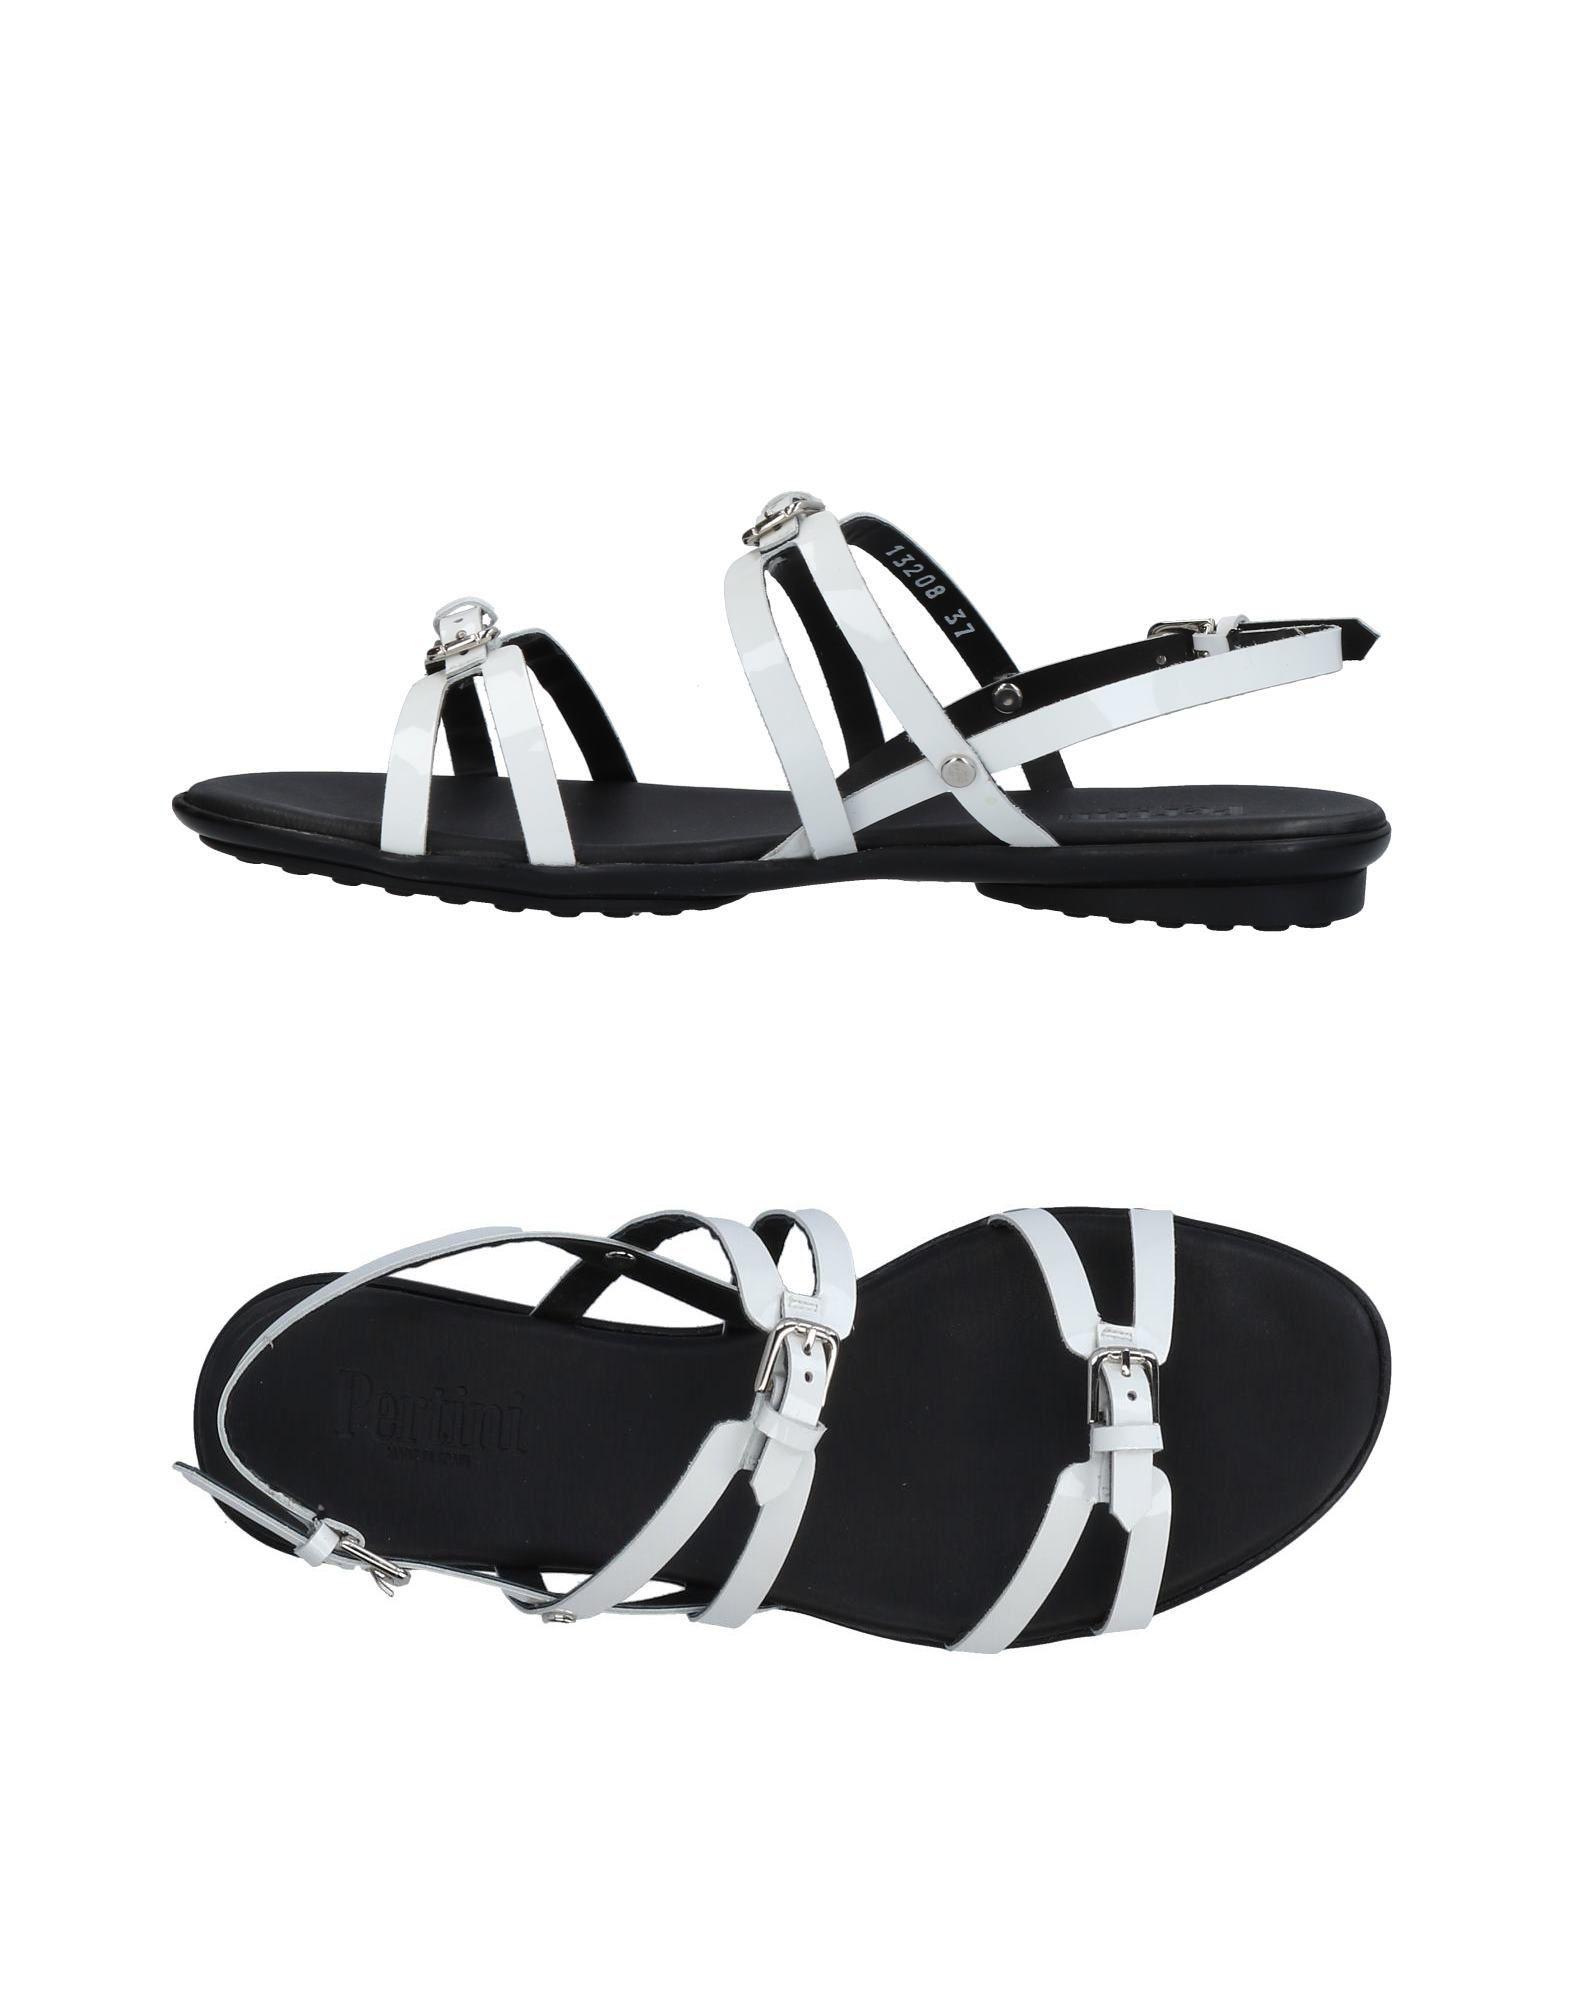 Moda Sandali Pertini Donna - 11458519ND